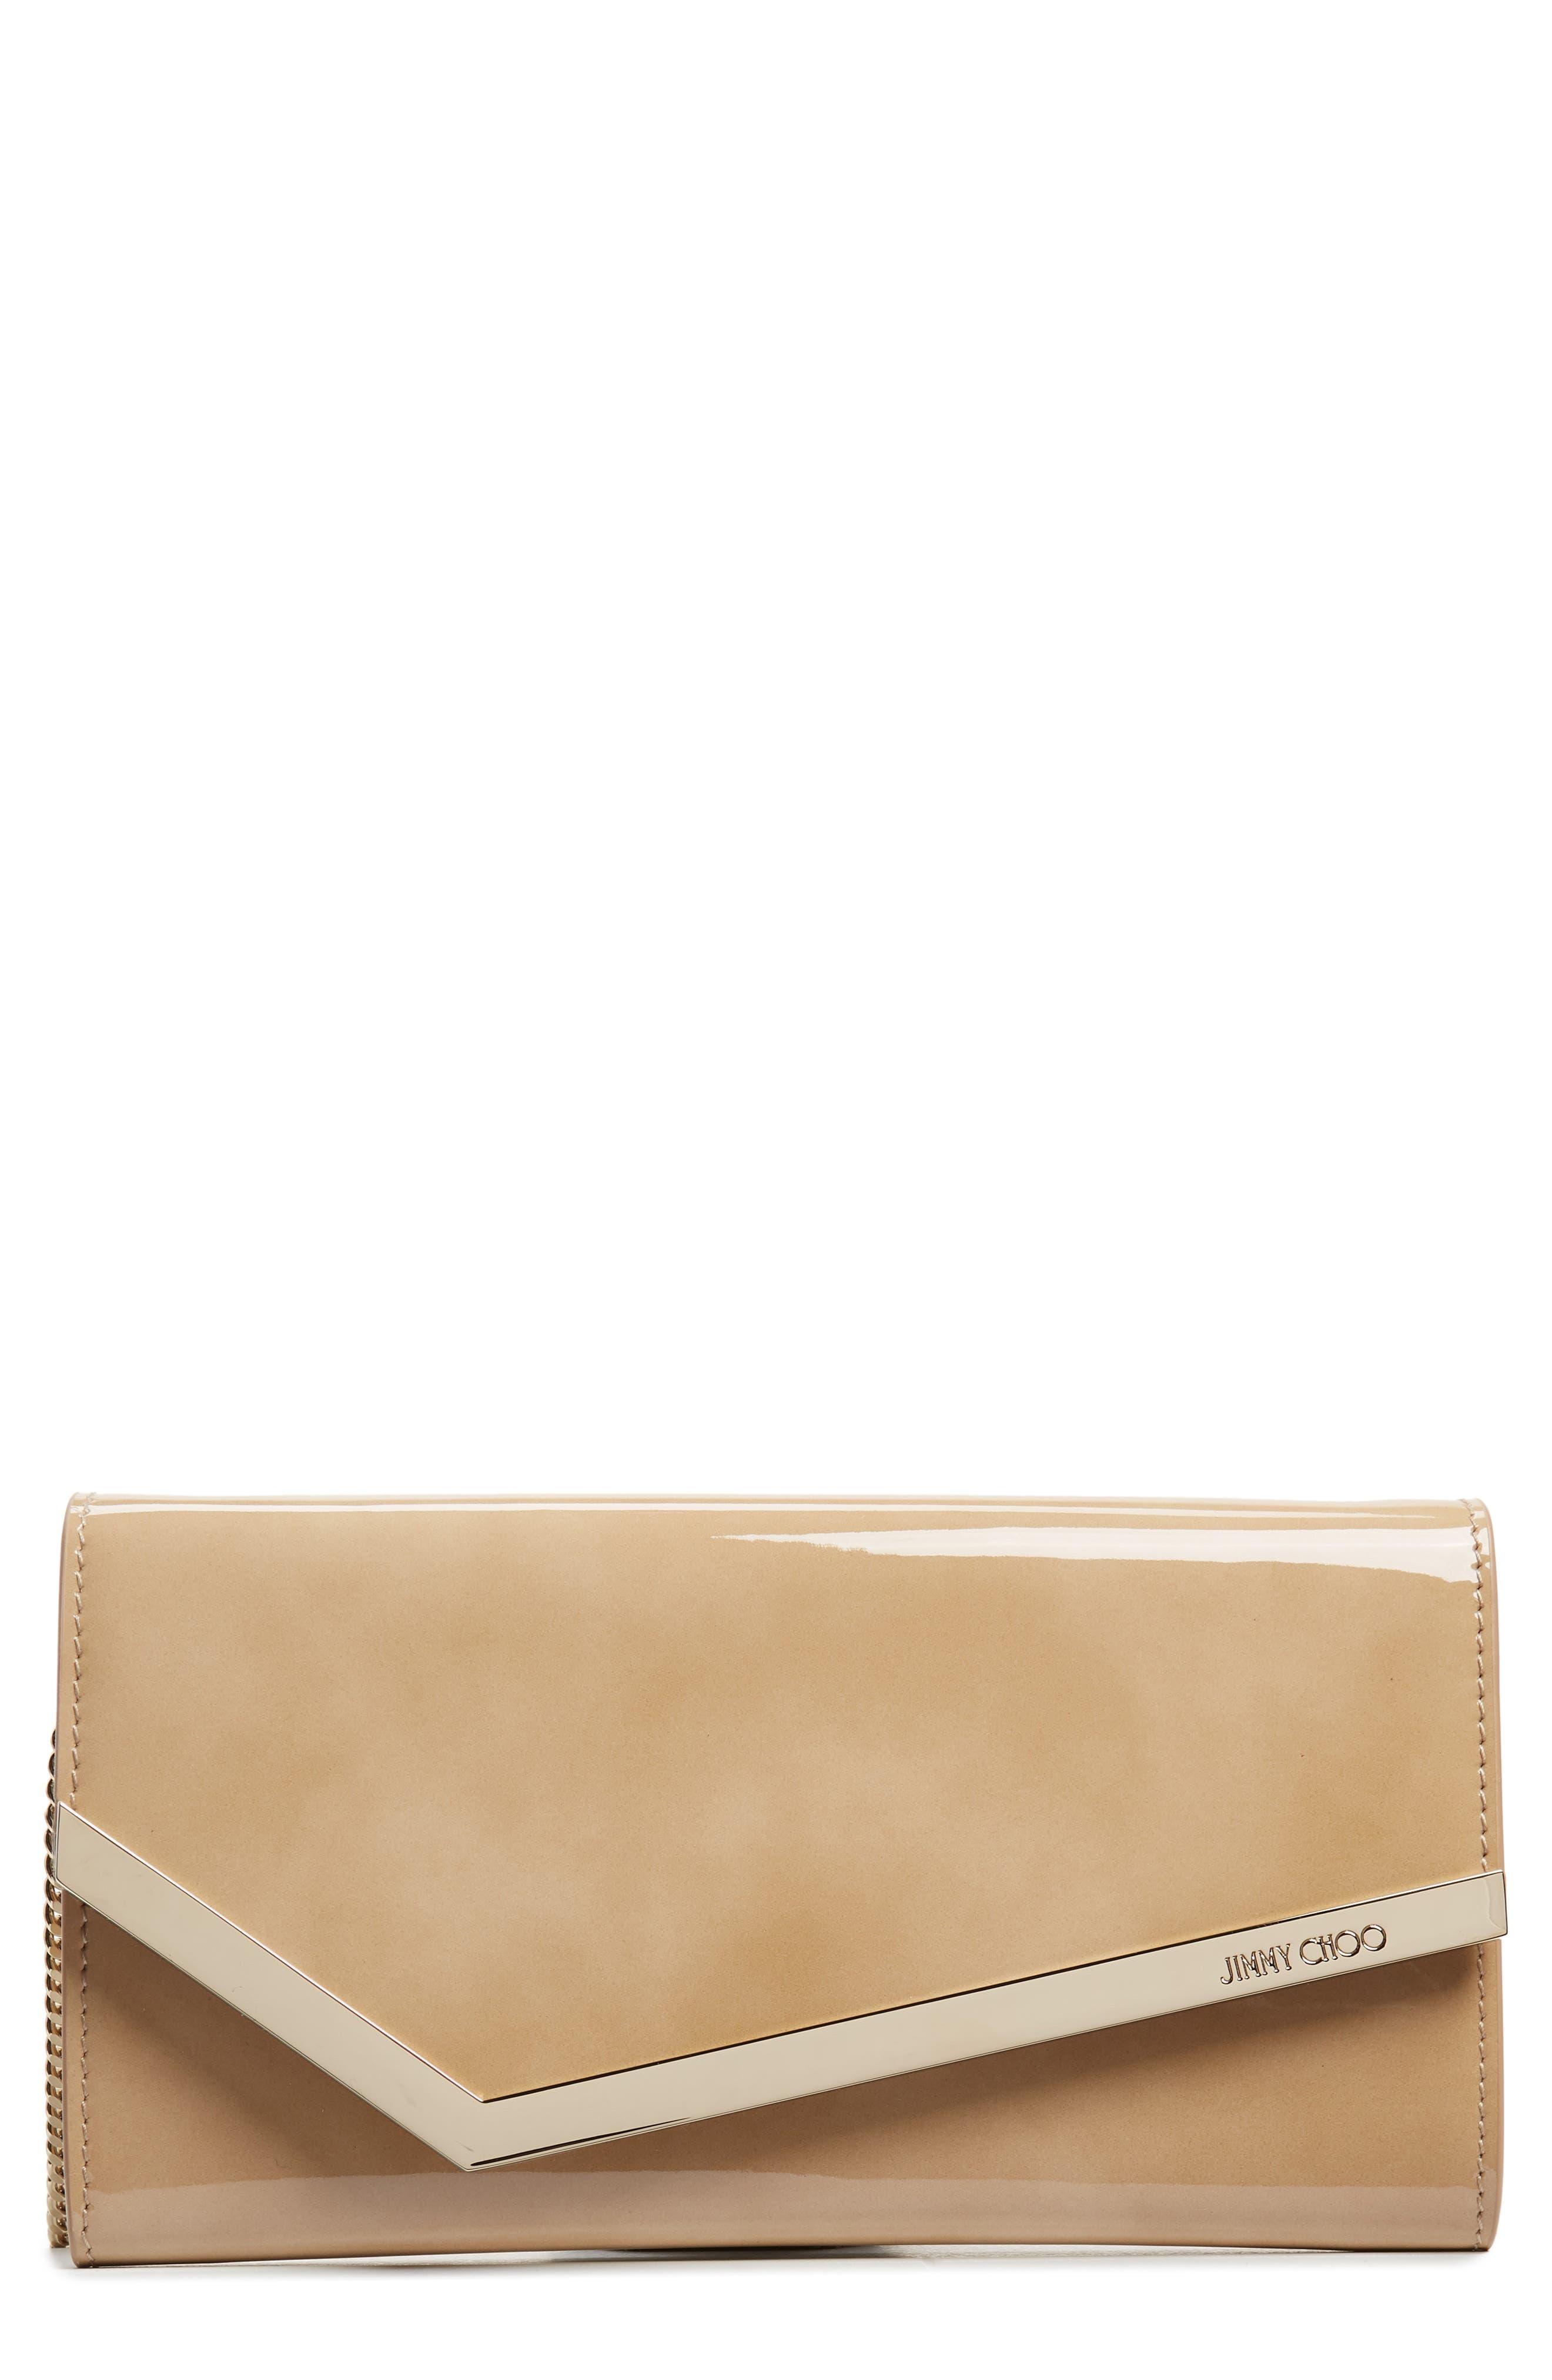 2727ac5329 Women's Jimmy Choo Handbags | Nordstrom